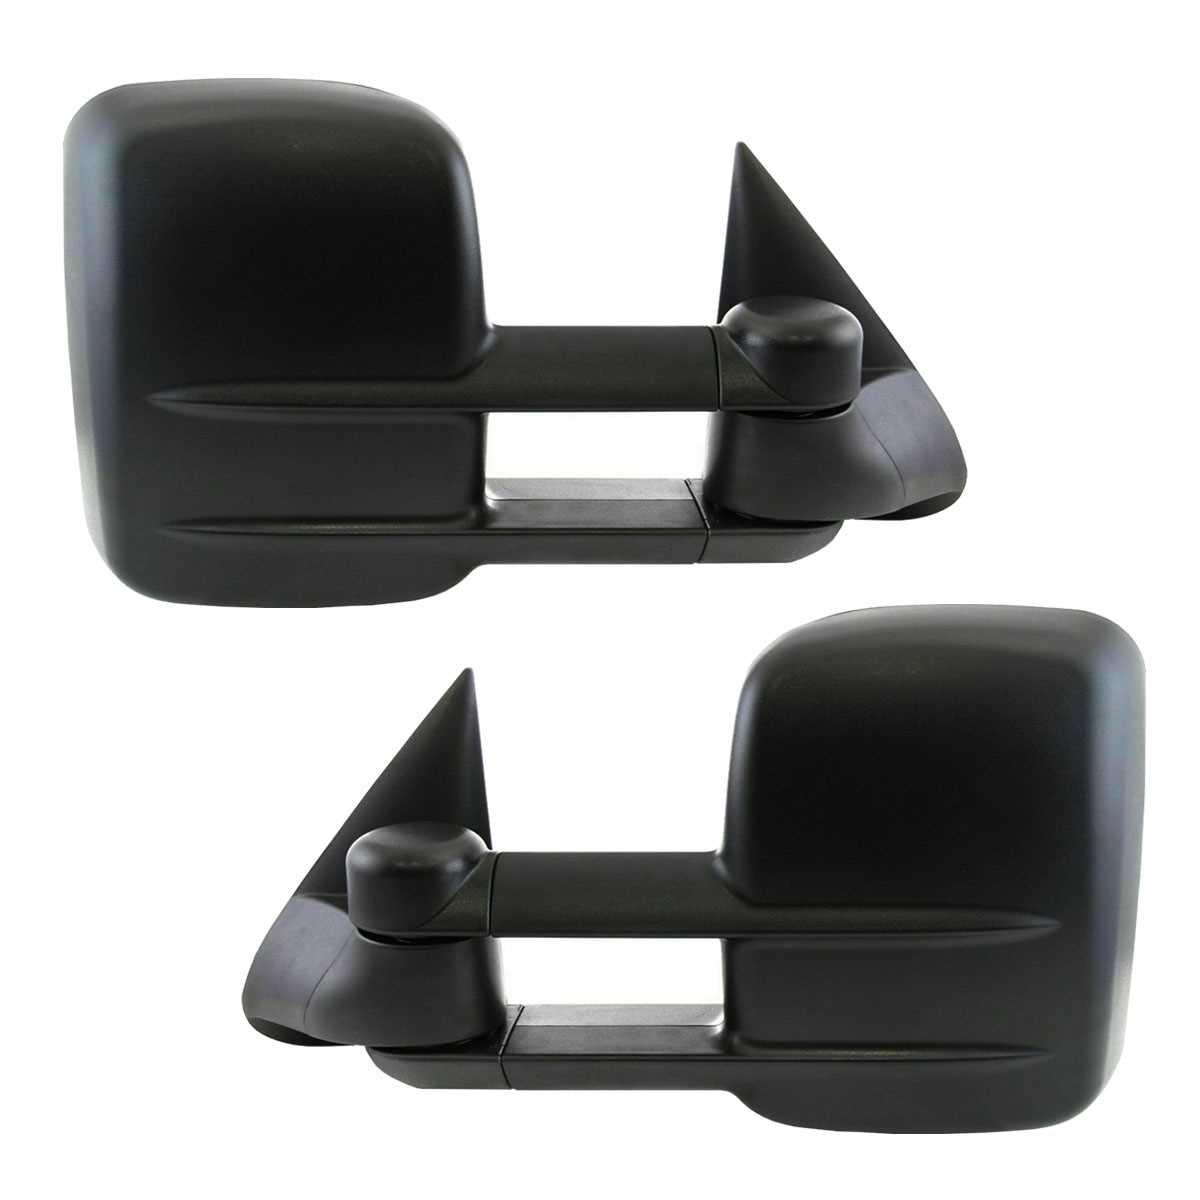 New-Pair-Power-Heated-Signal-Side-Mirror-Fits-2003-2006-Chevrolet-Silverado-1500 thumbnail 2